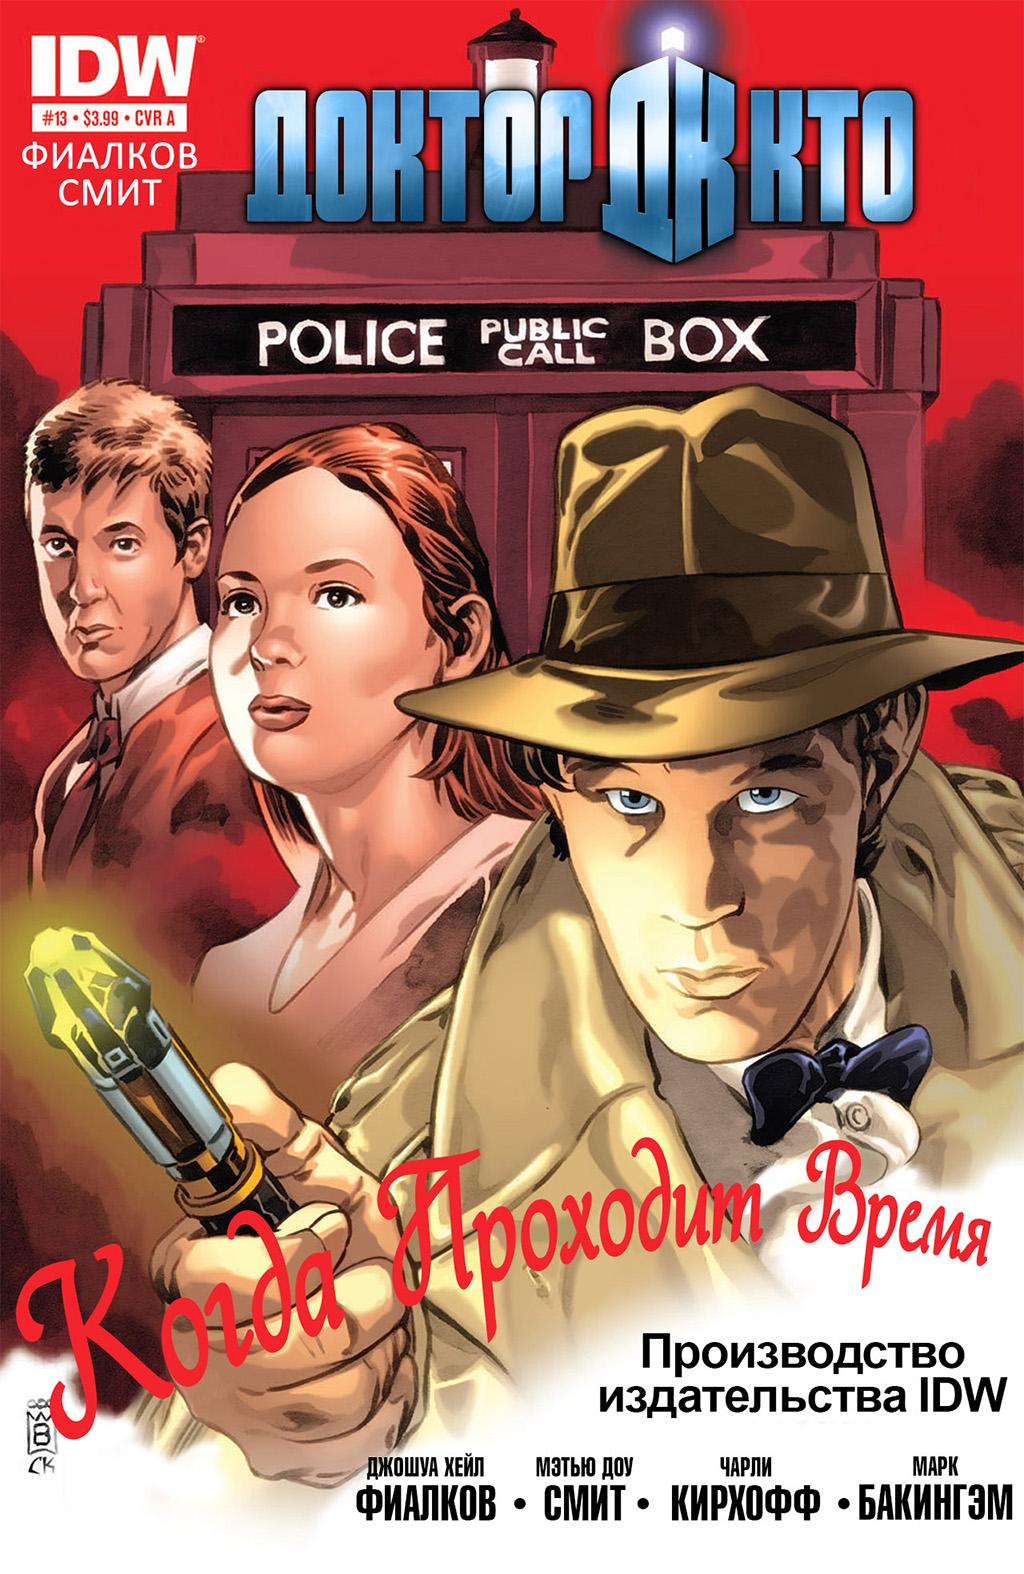 Комикс Доктор Кто том 2